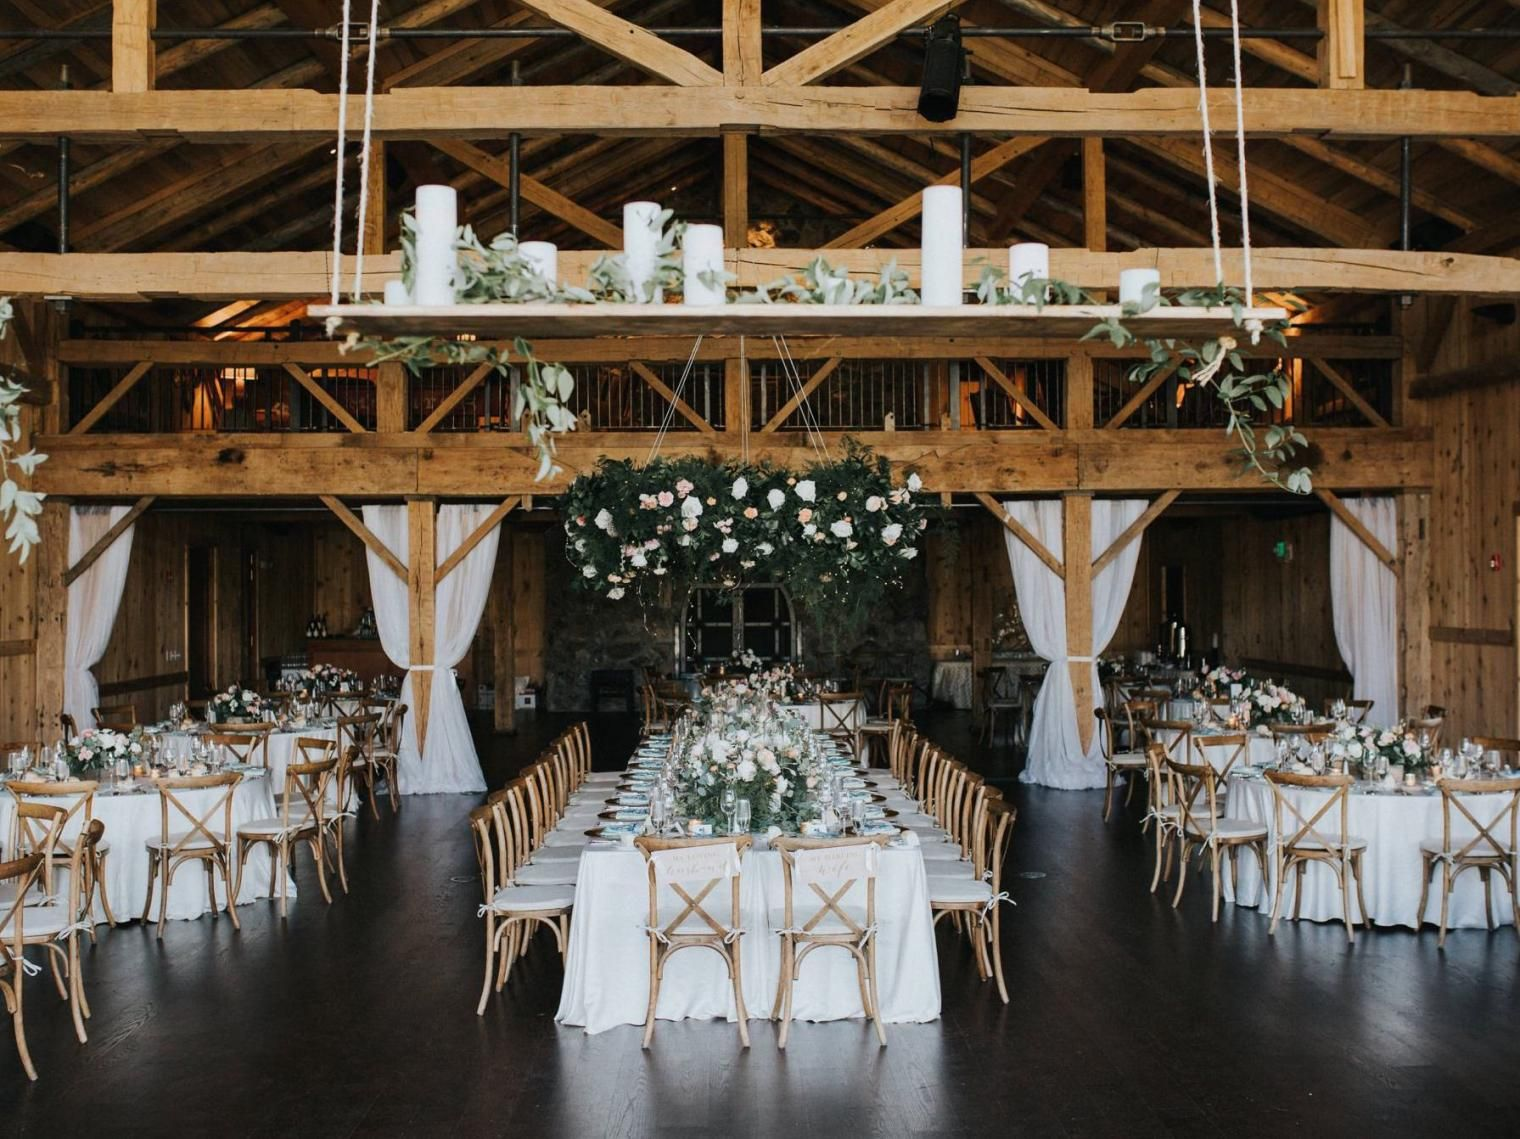 The Most Breathtaking Wedding Venues In Colorado Cheap Wedding Venues Colorado Wedding Venues Wedding Venues Toronto